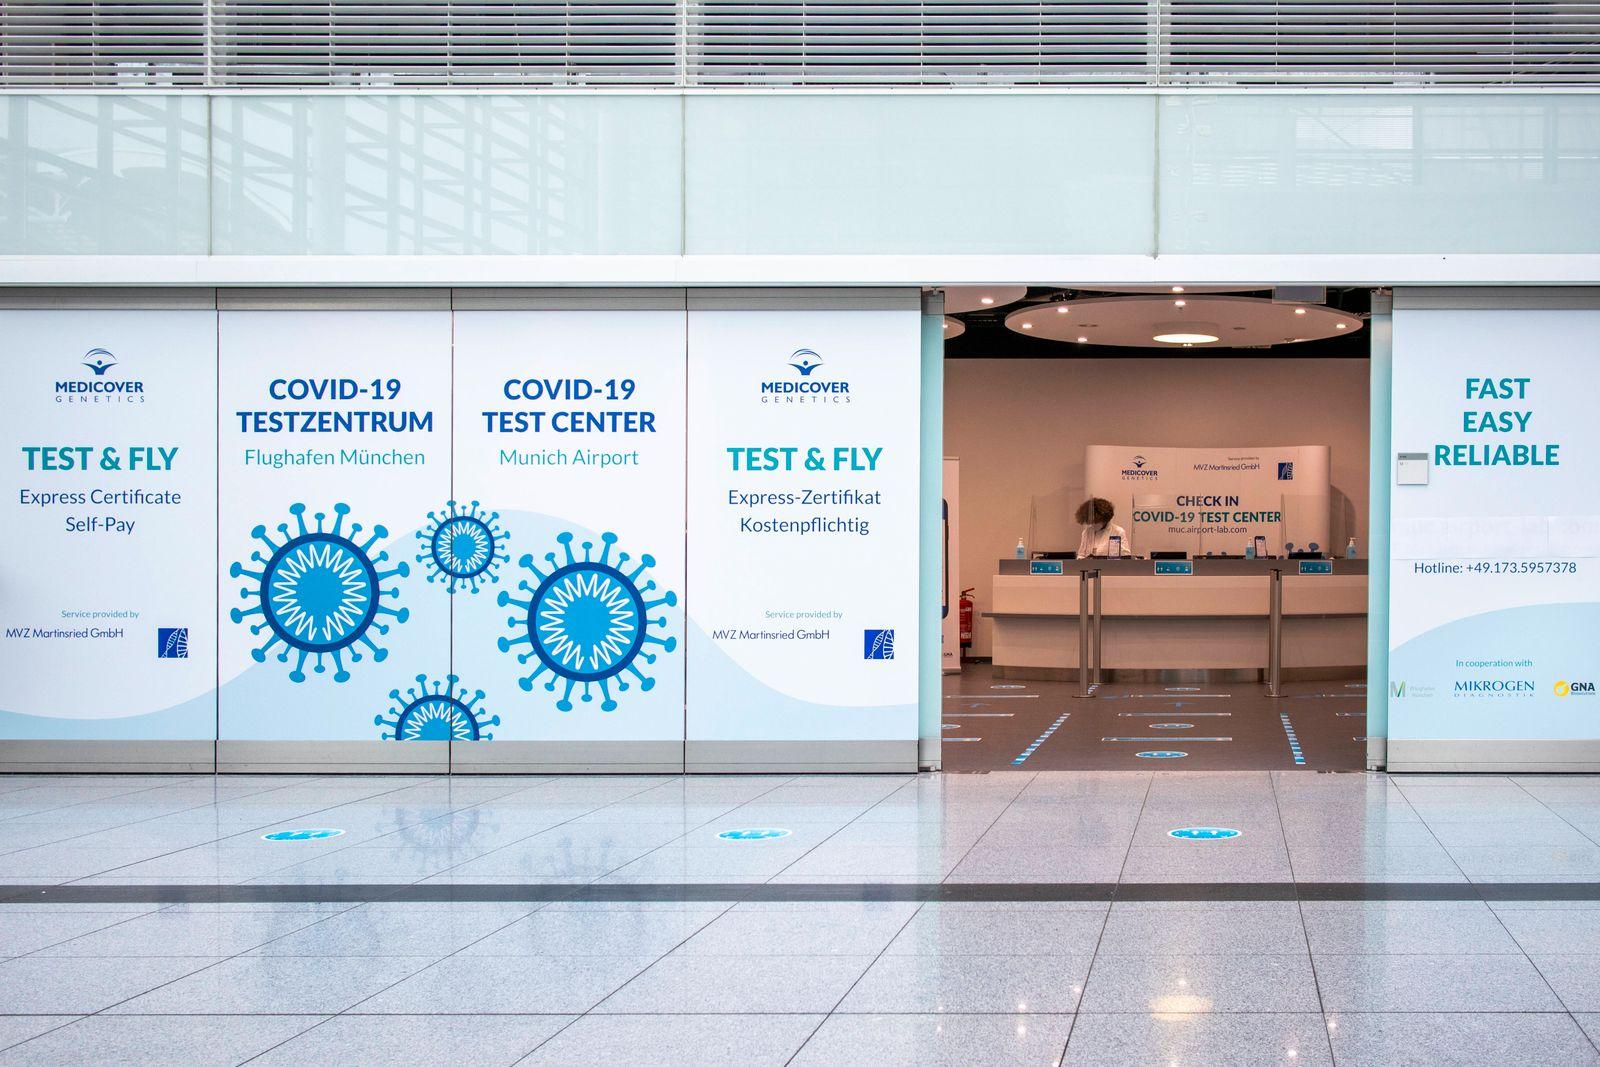 Corona Test Center am Flughafen München *** Corona Test Center at Munich Airport